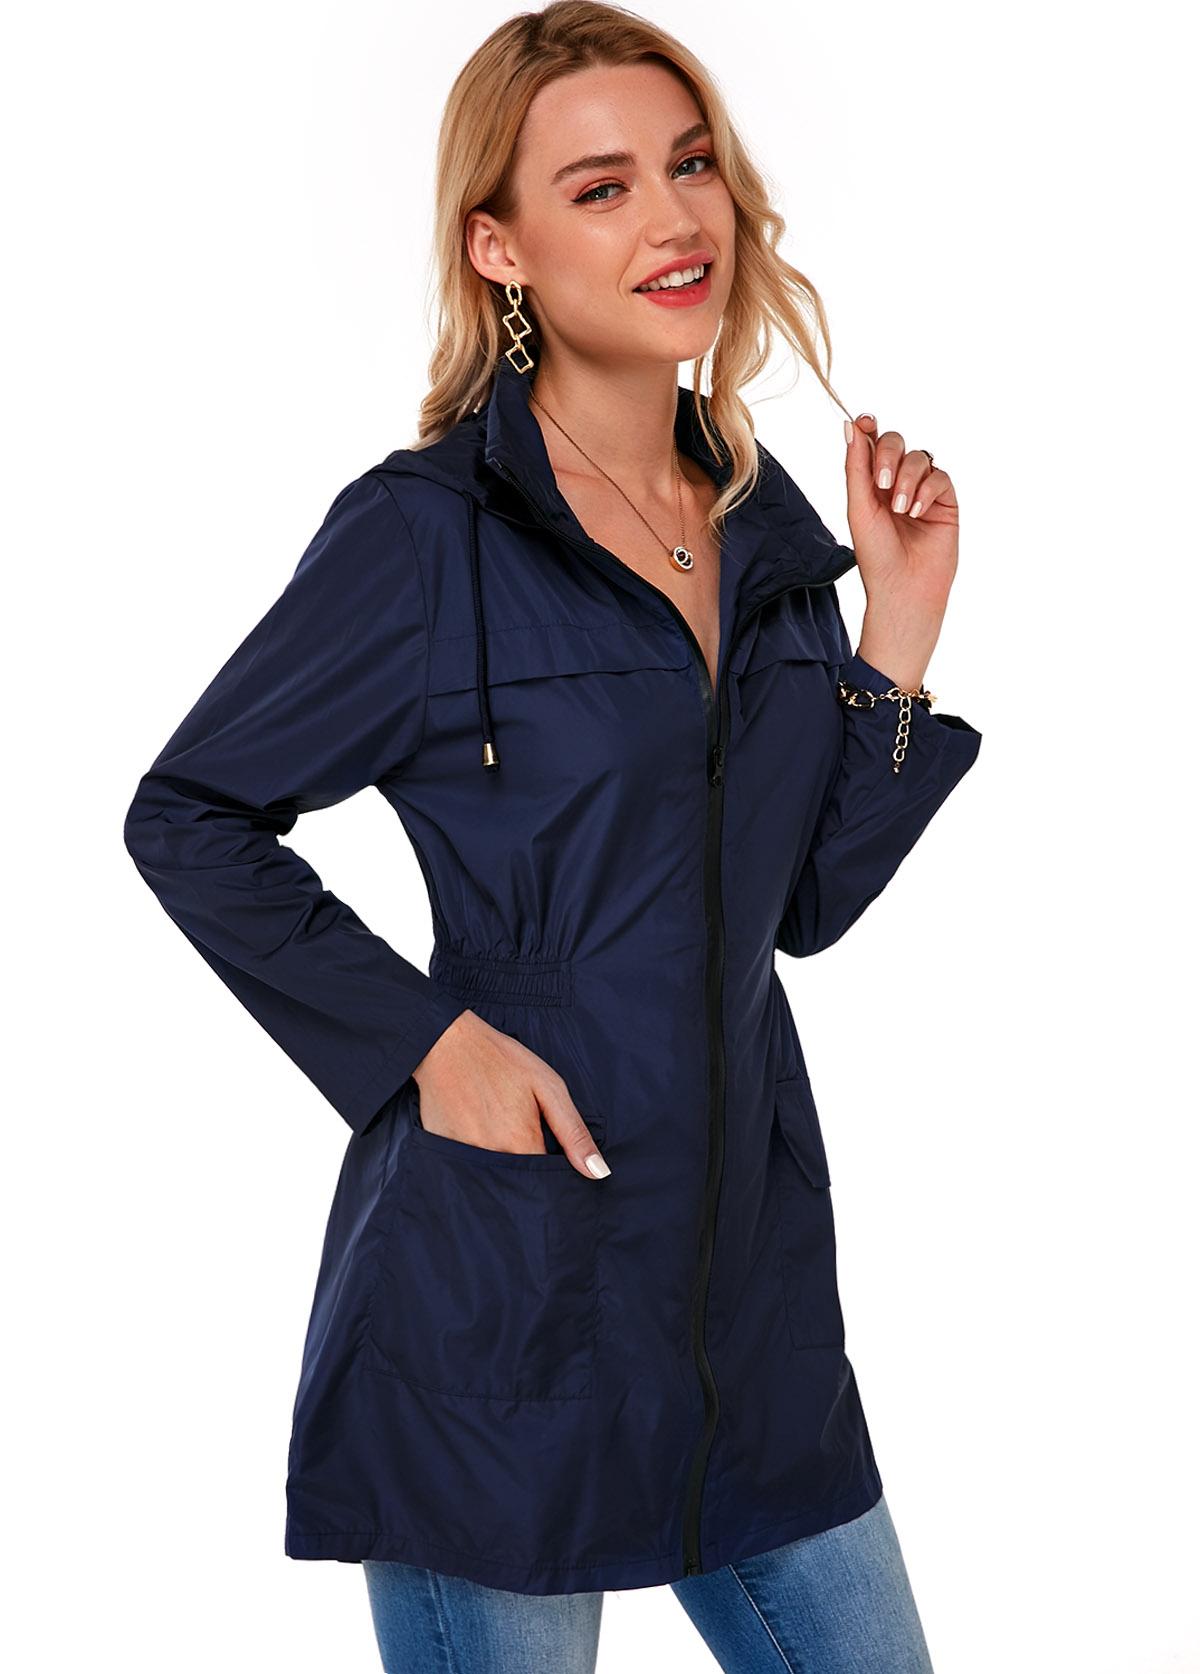 Hooded Collar Waterproof Zipper Closure Jacket